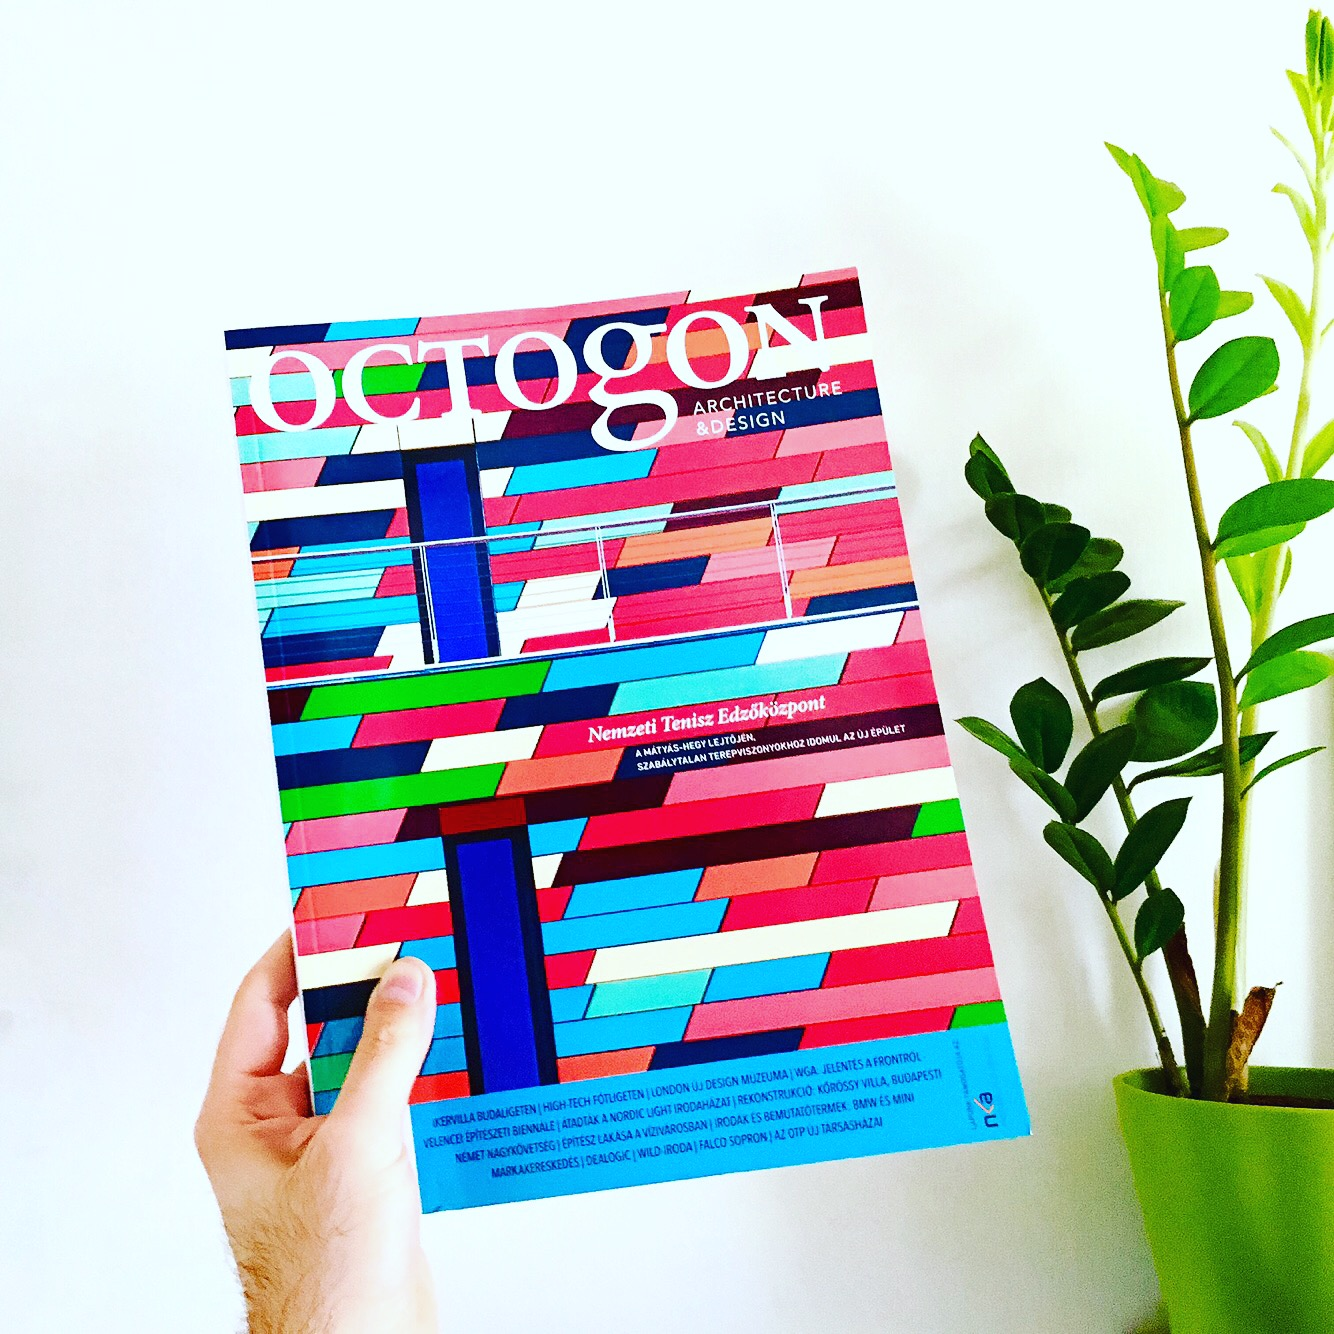 OCTOGON 132.